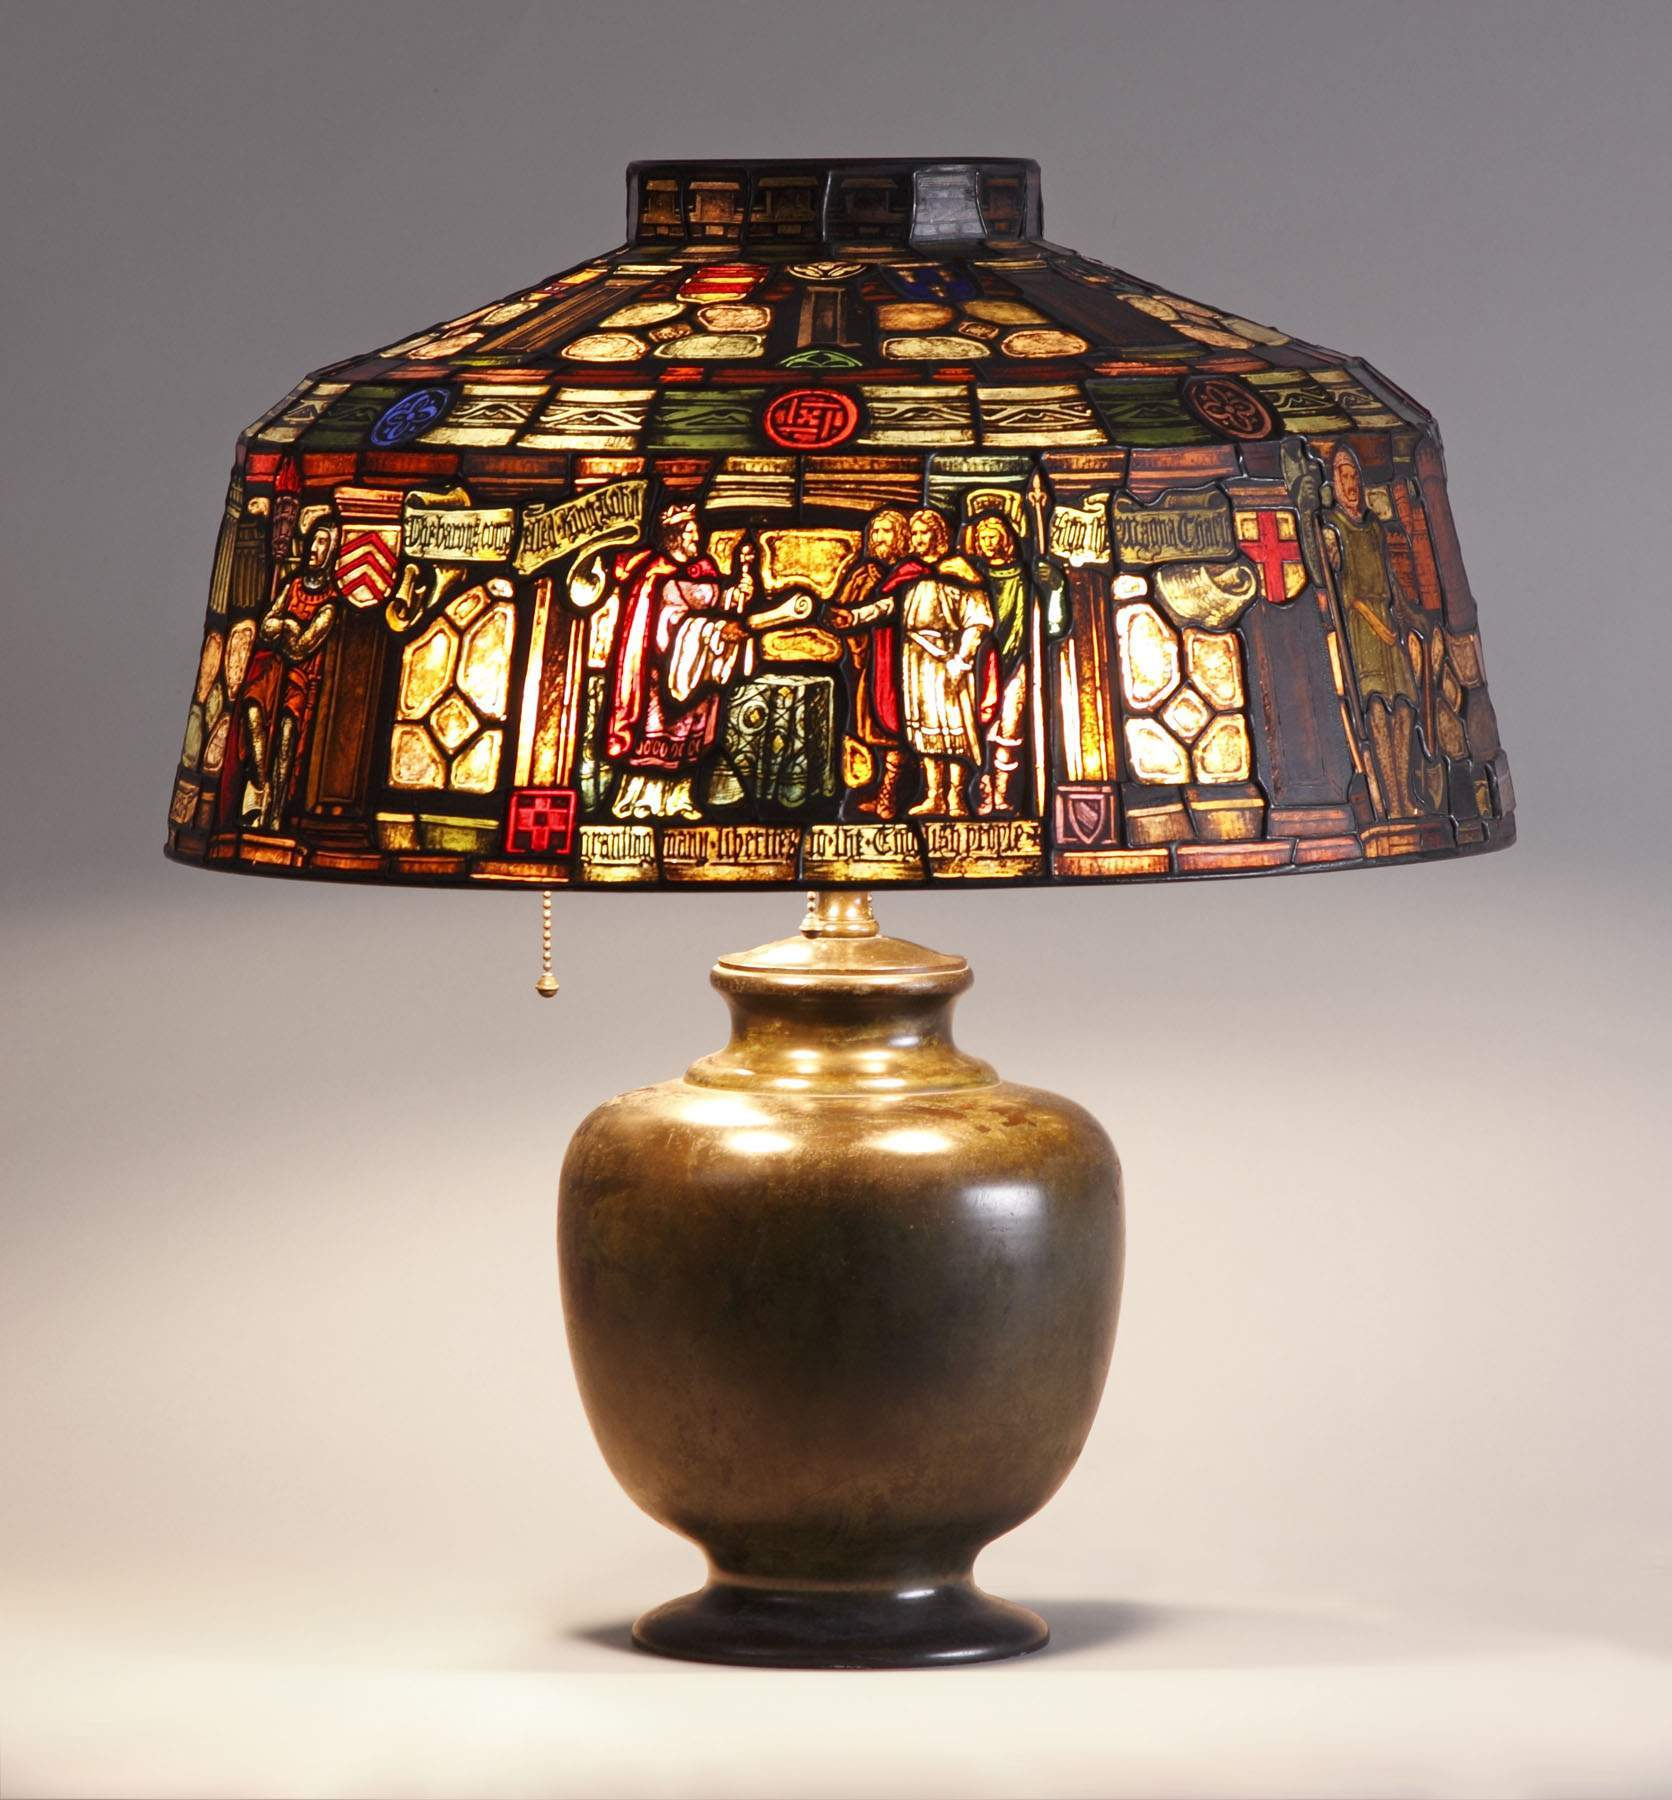 duffner u0026 kimberly leaded u0026 stained glass lamp depicting magna carta